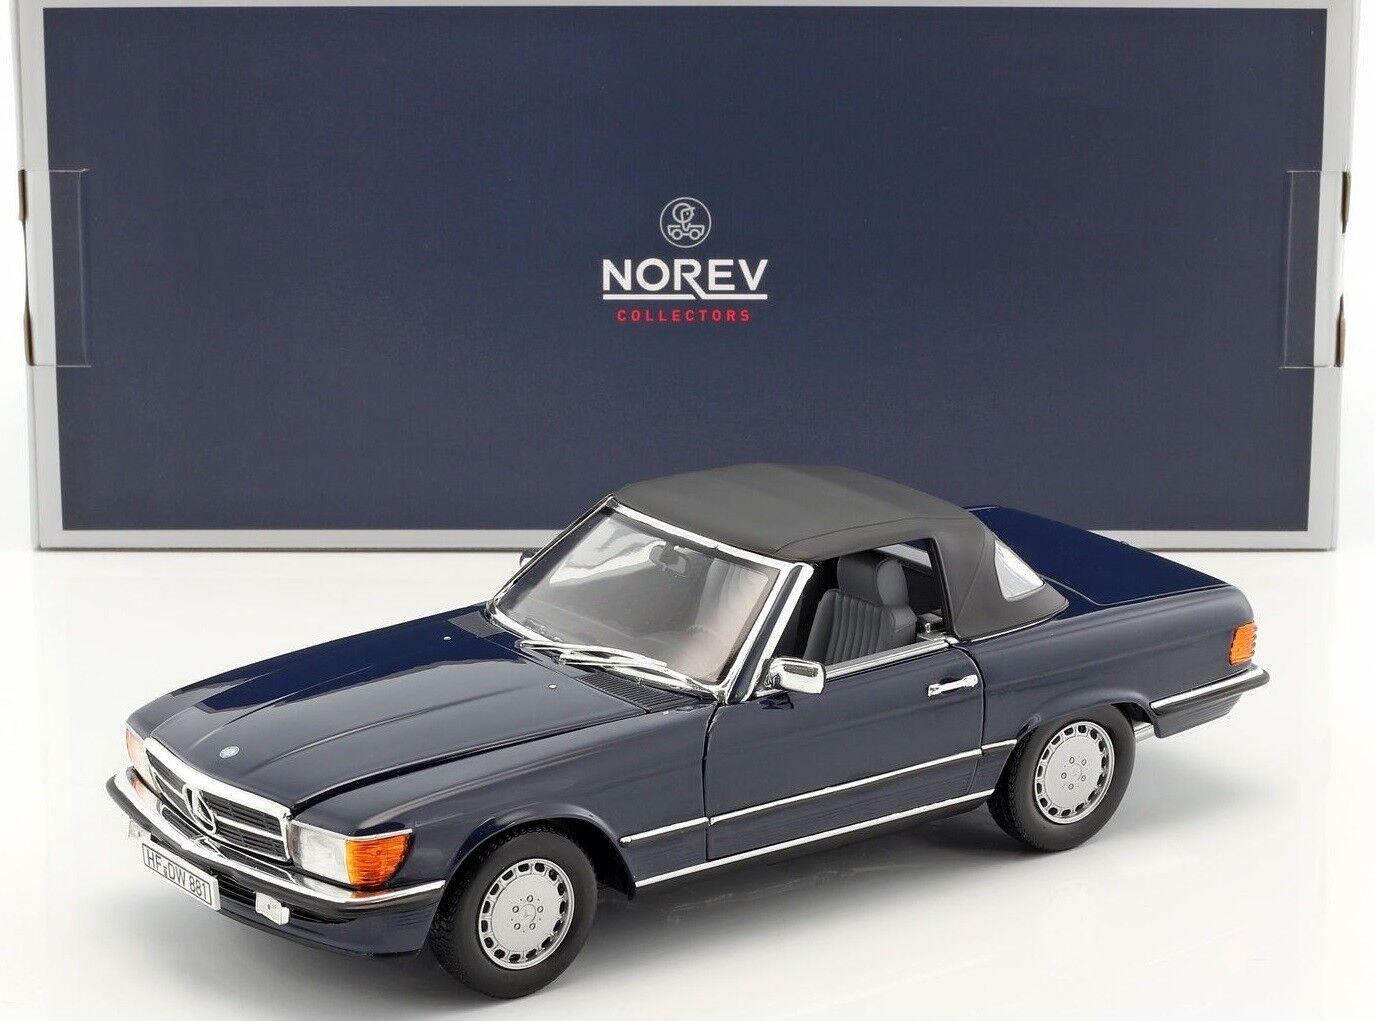 NOREV183466 - Voiture cabriolet MERCEDES 300 SL bleu de 1986 - 1 18